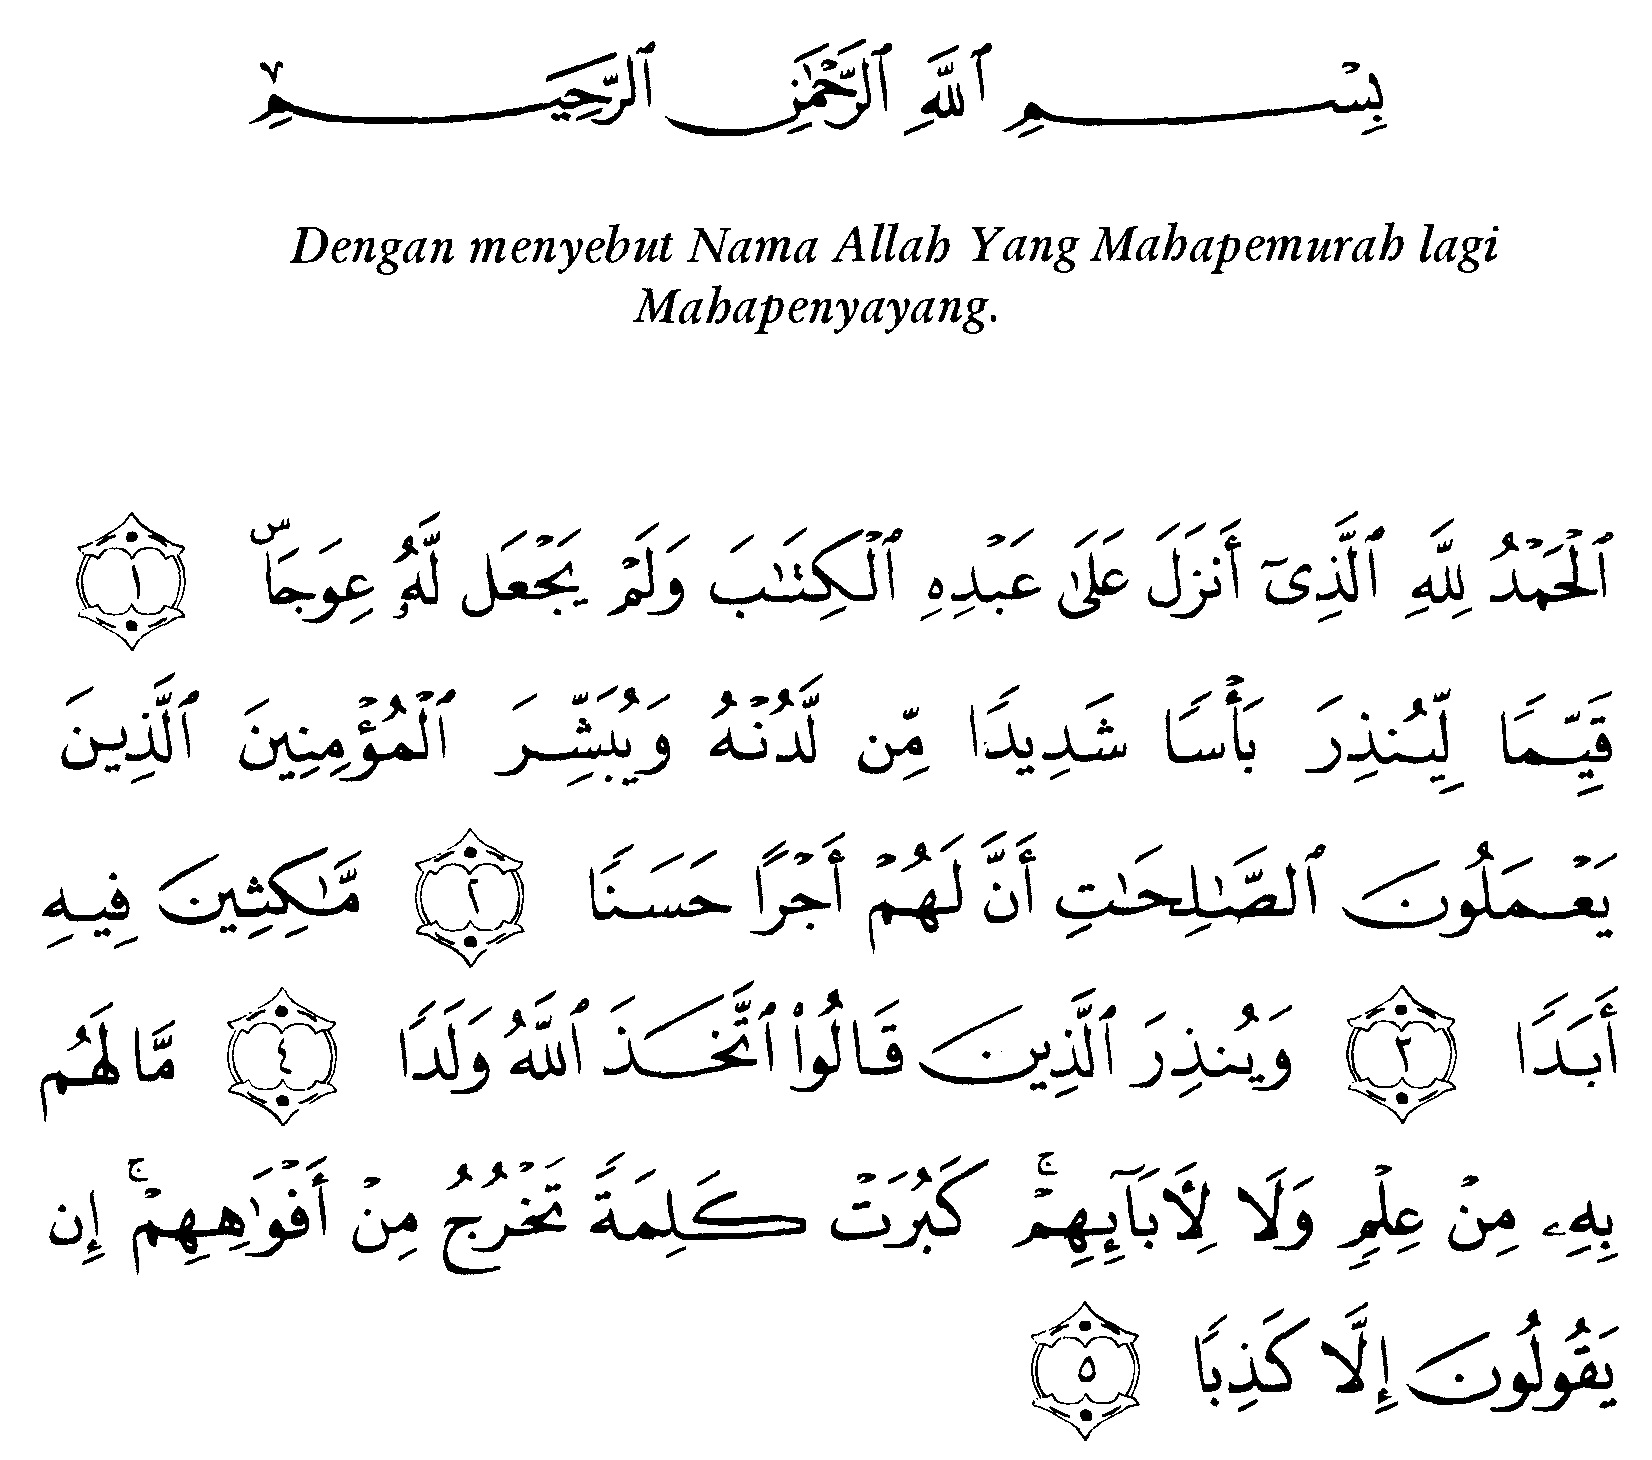 Tafsir Ibnu Katsir Surah Al Kahfi 1 Alquranmulia